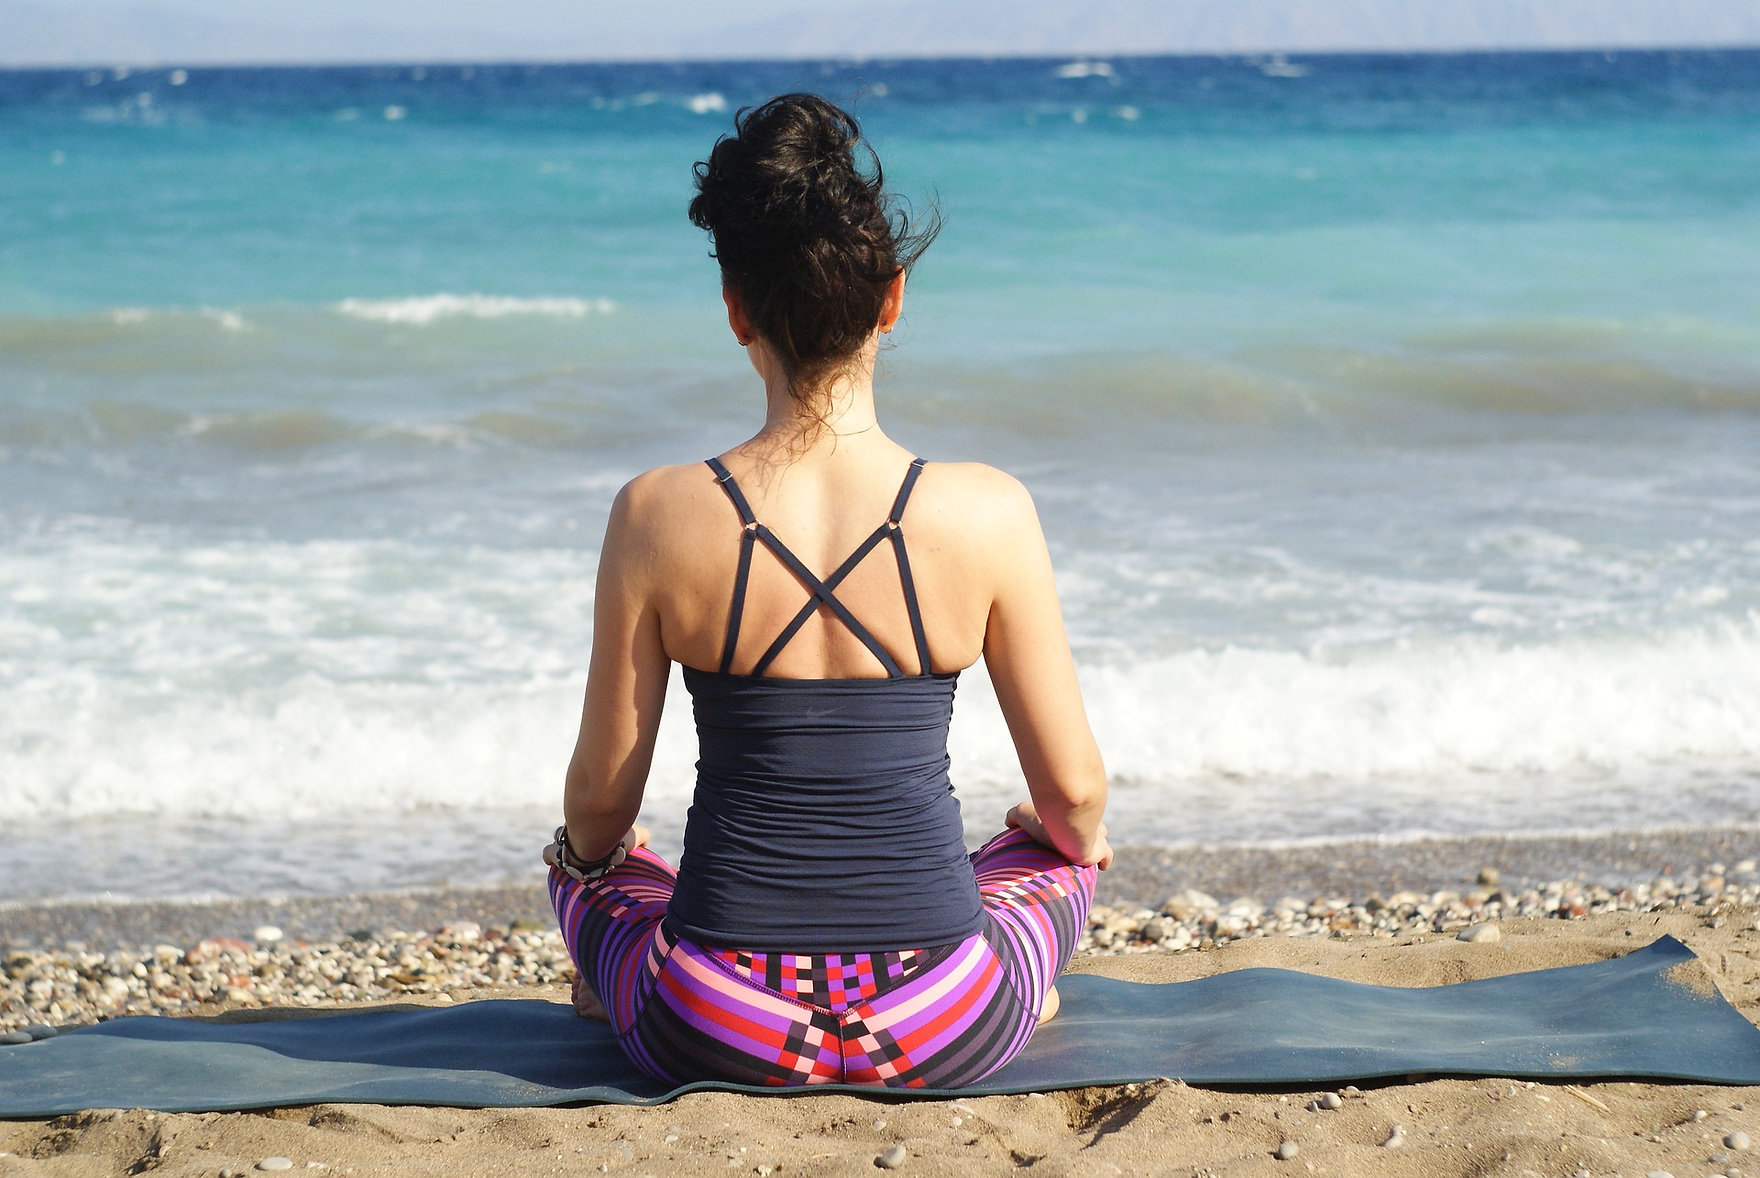 valerie schraauwers bien-être feminin noirmoutier massage bien-être